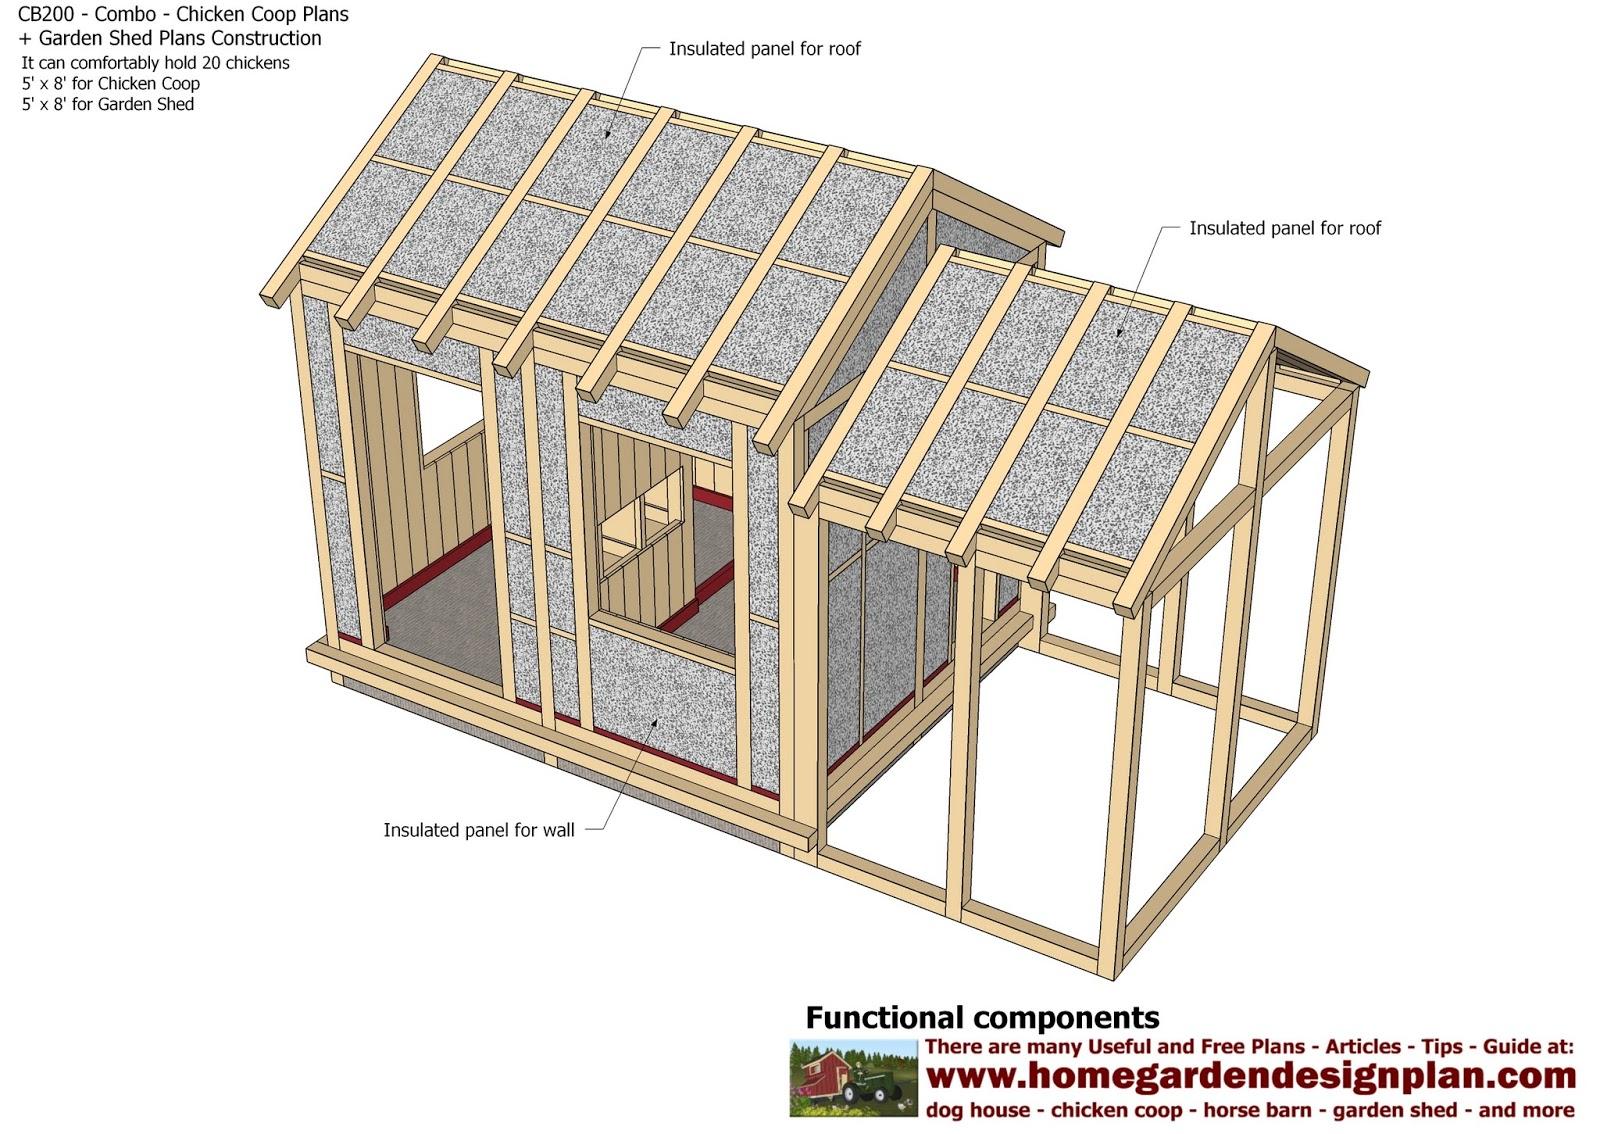 Home Garden Plans Cb200 Combo En Coop Construction Sheds Storage